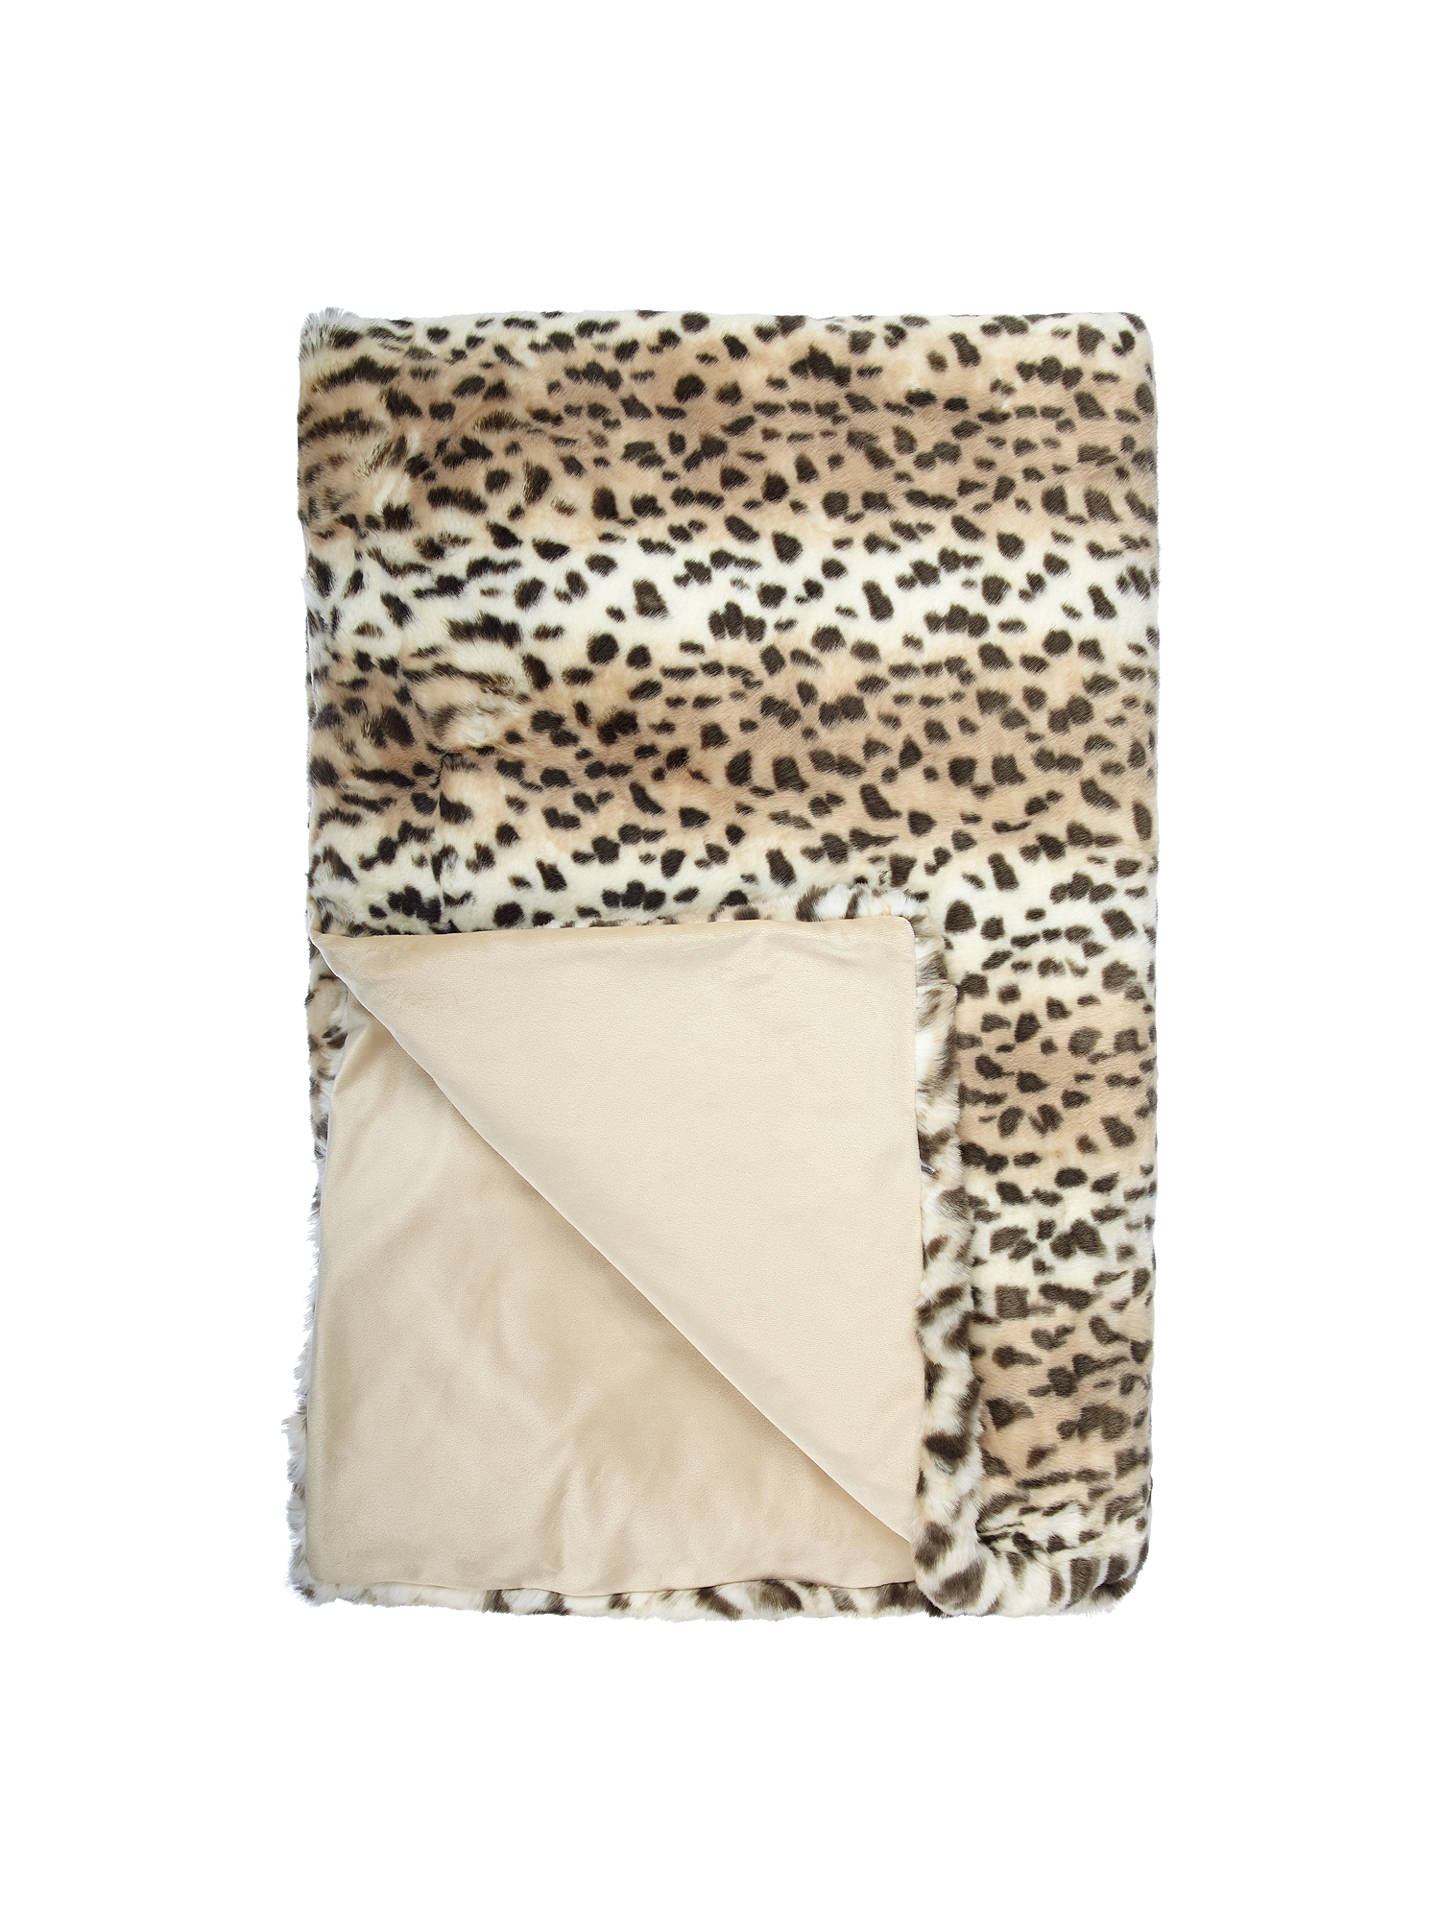 john lewis partners faux fur throw at john lewis partners. Black Bedroom Furniture Sets. Home Design Ideas